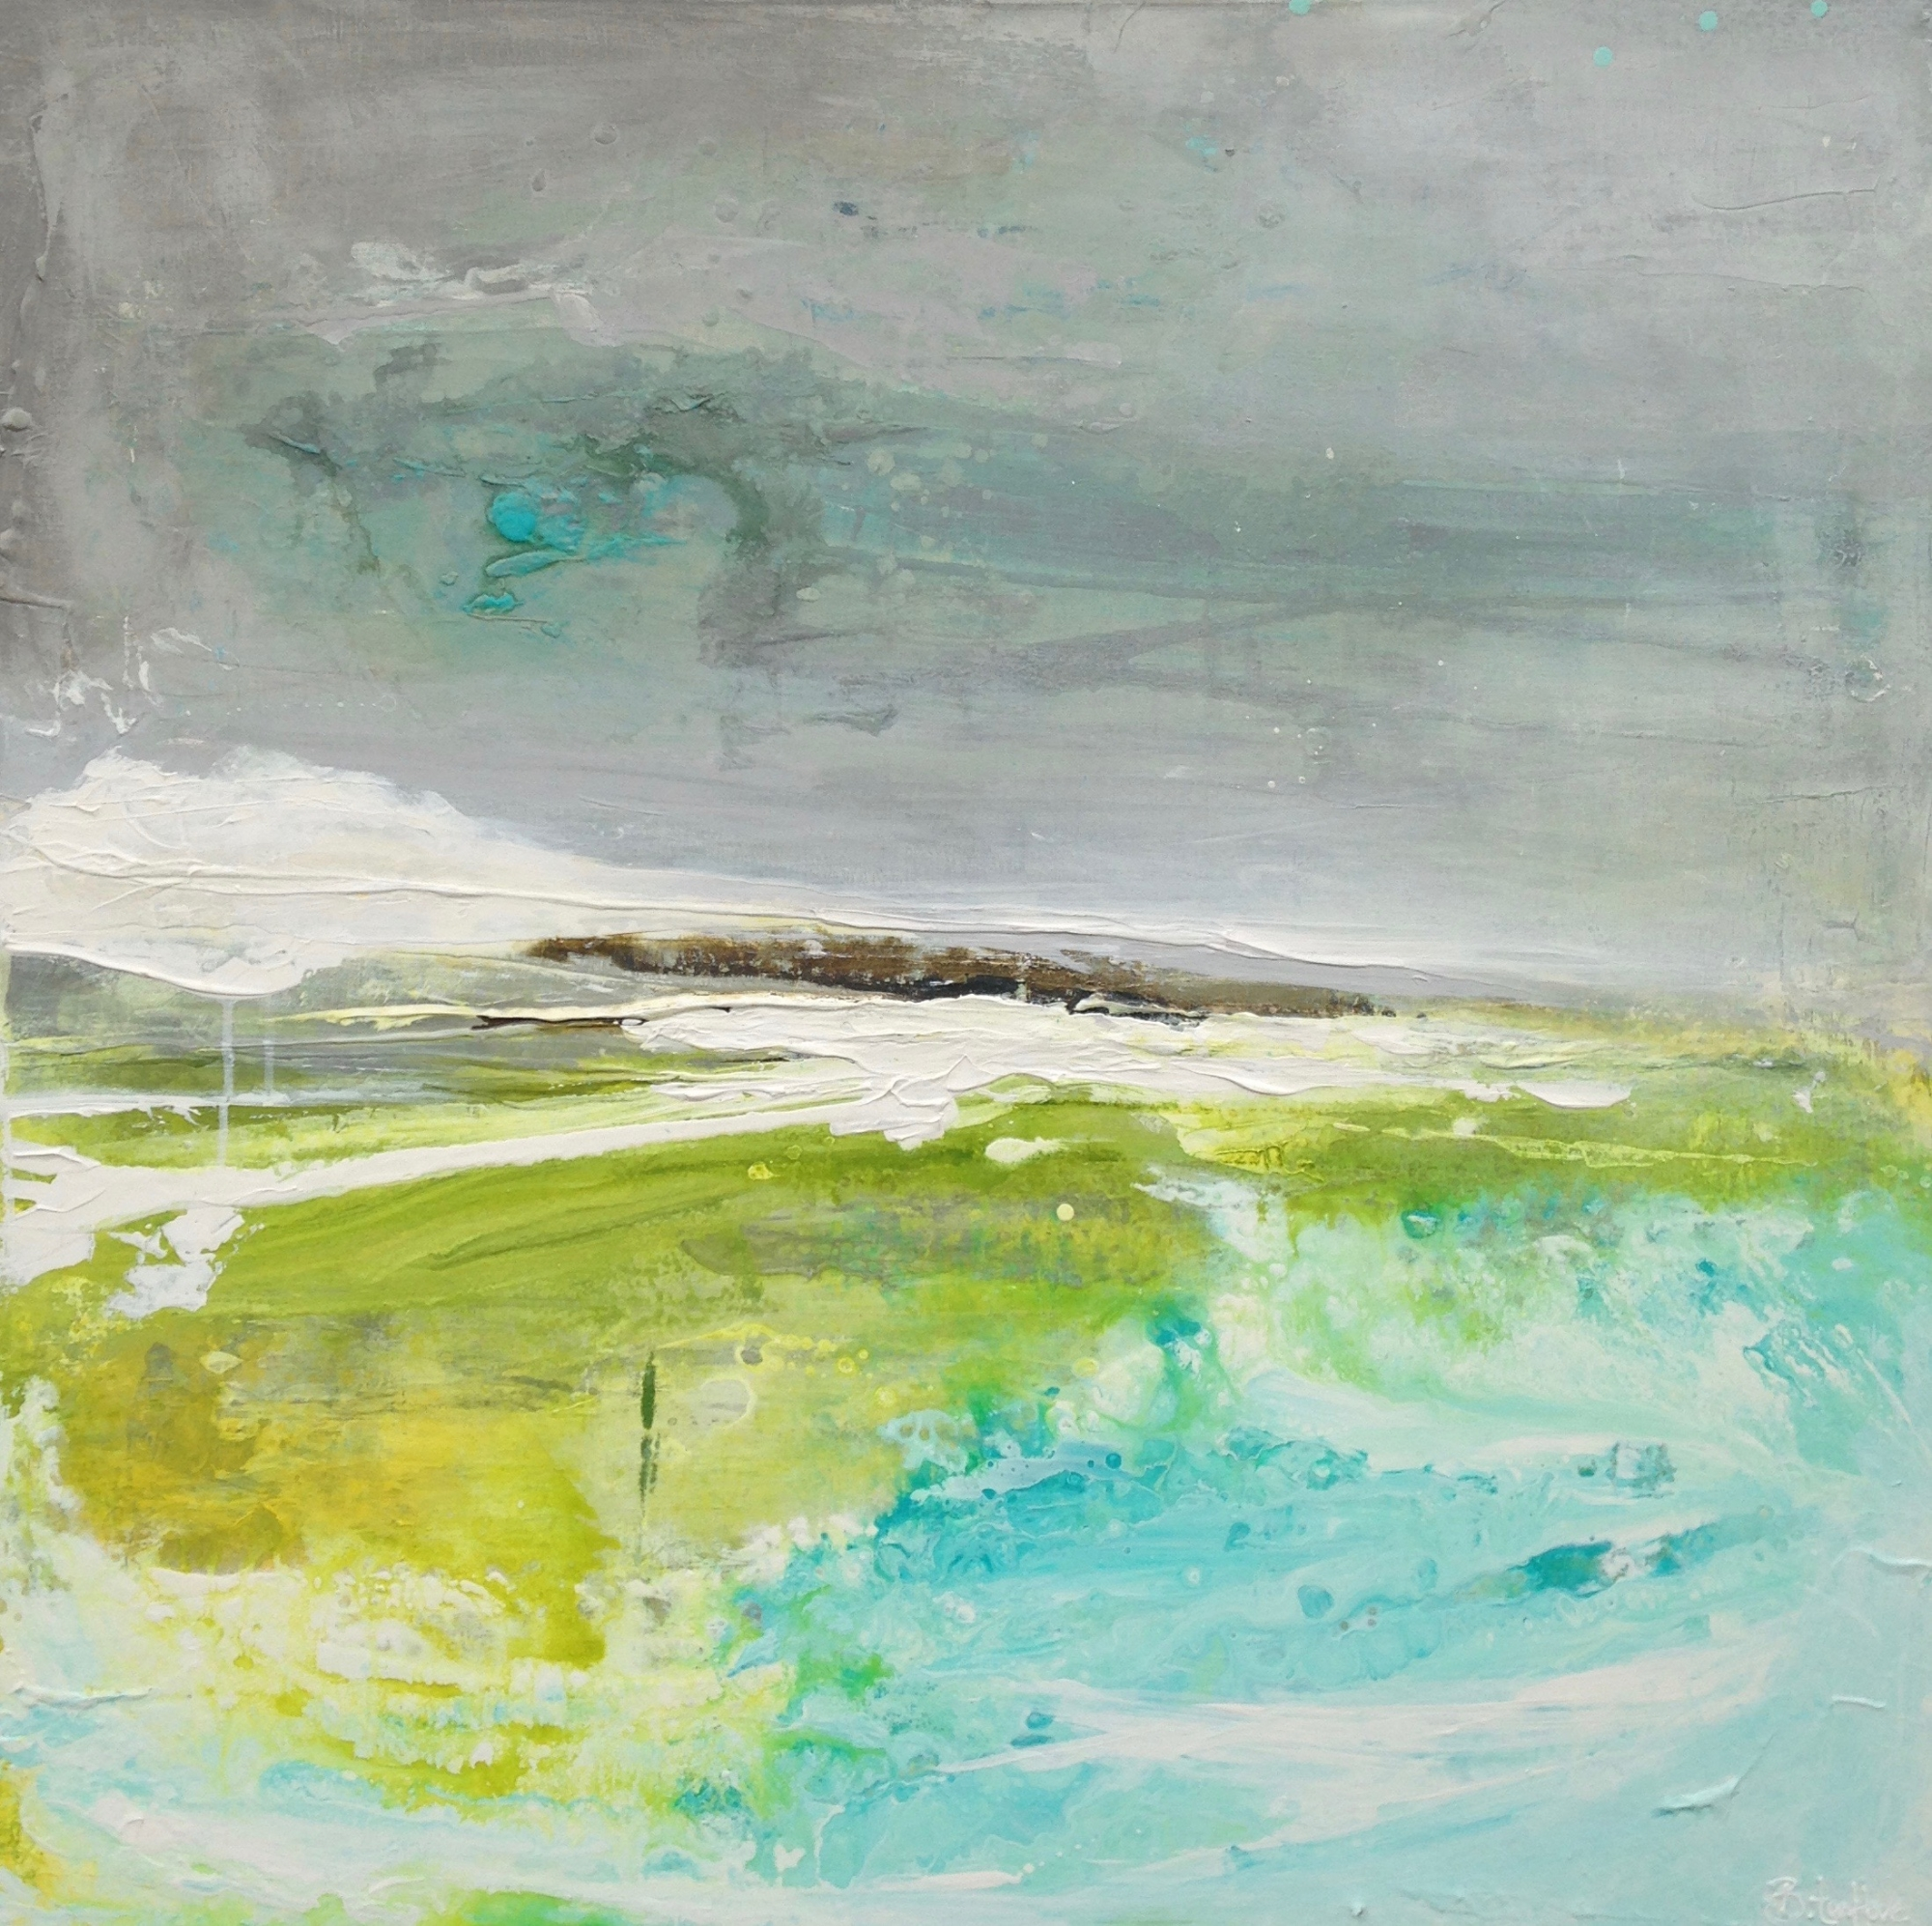 Spring Renewal  by Beth  ten Hove